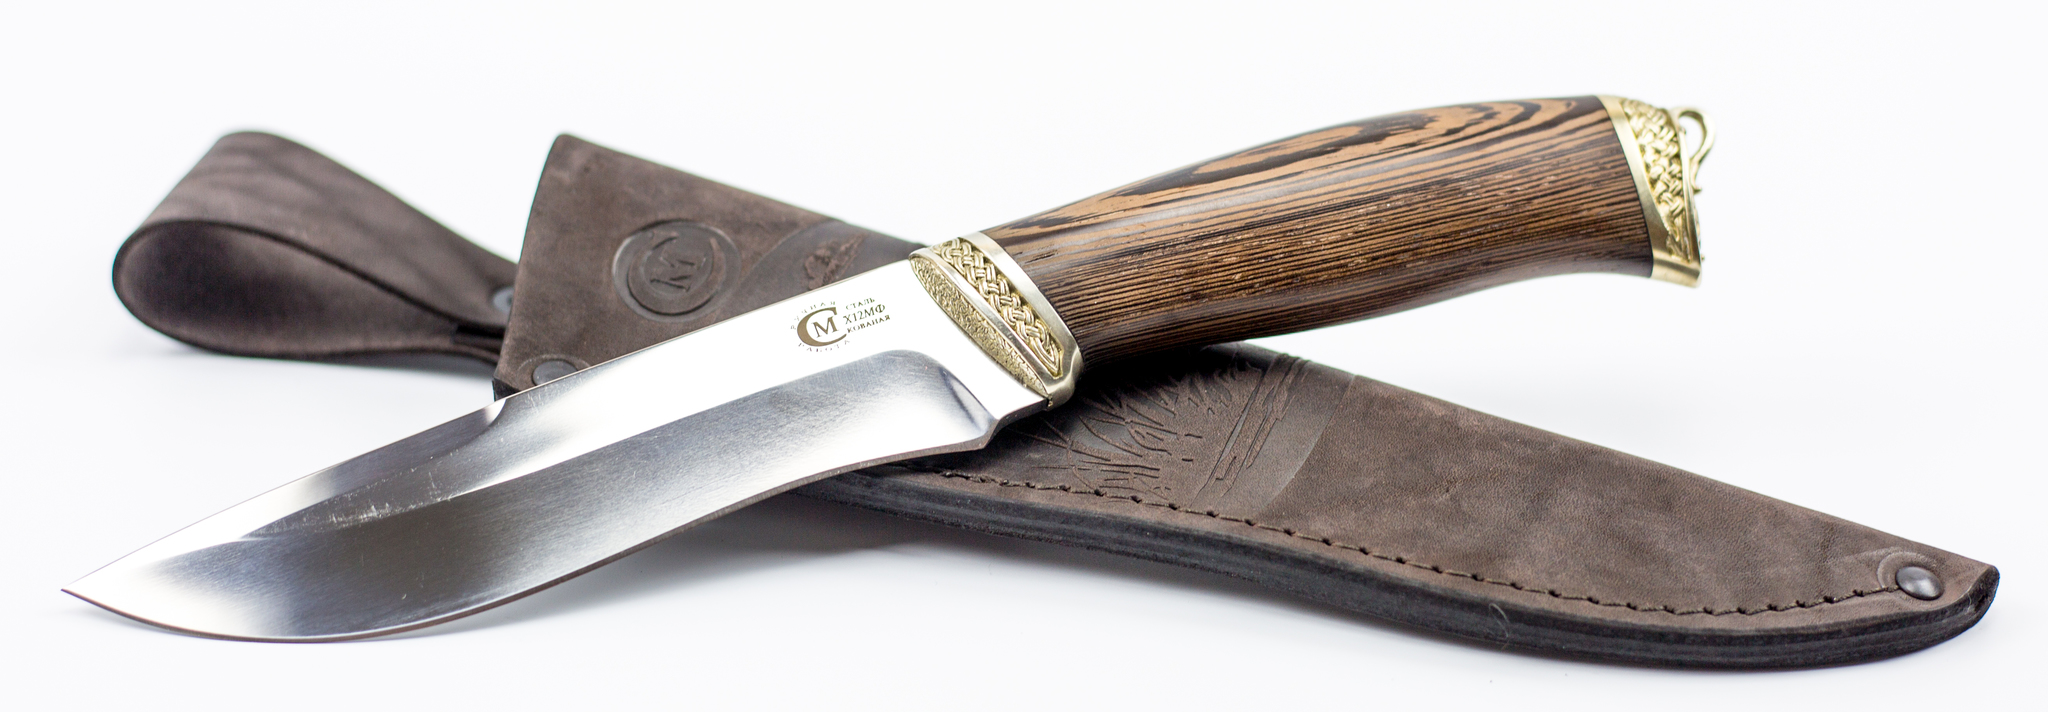 Фото 5 - Нож из Х12МФ